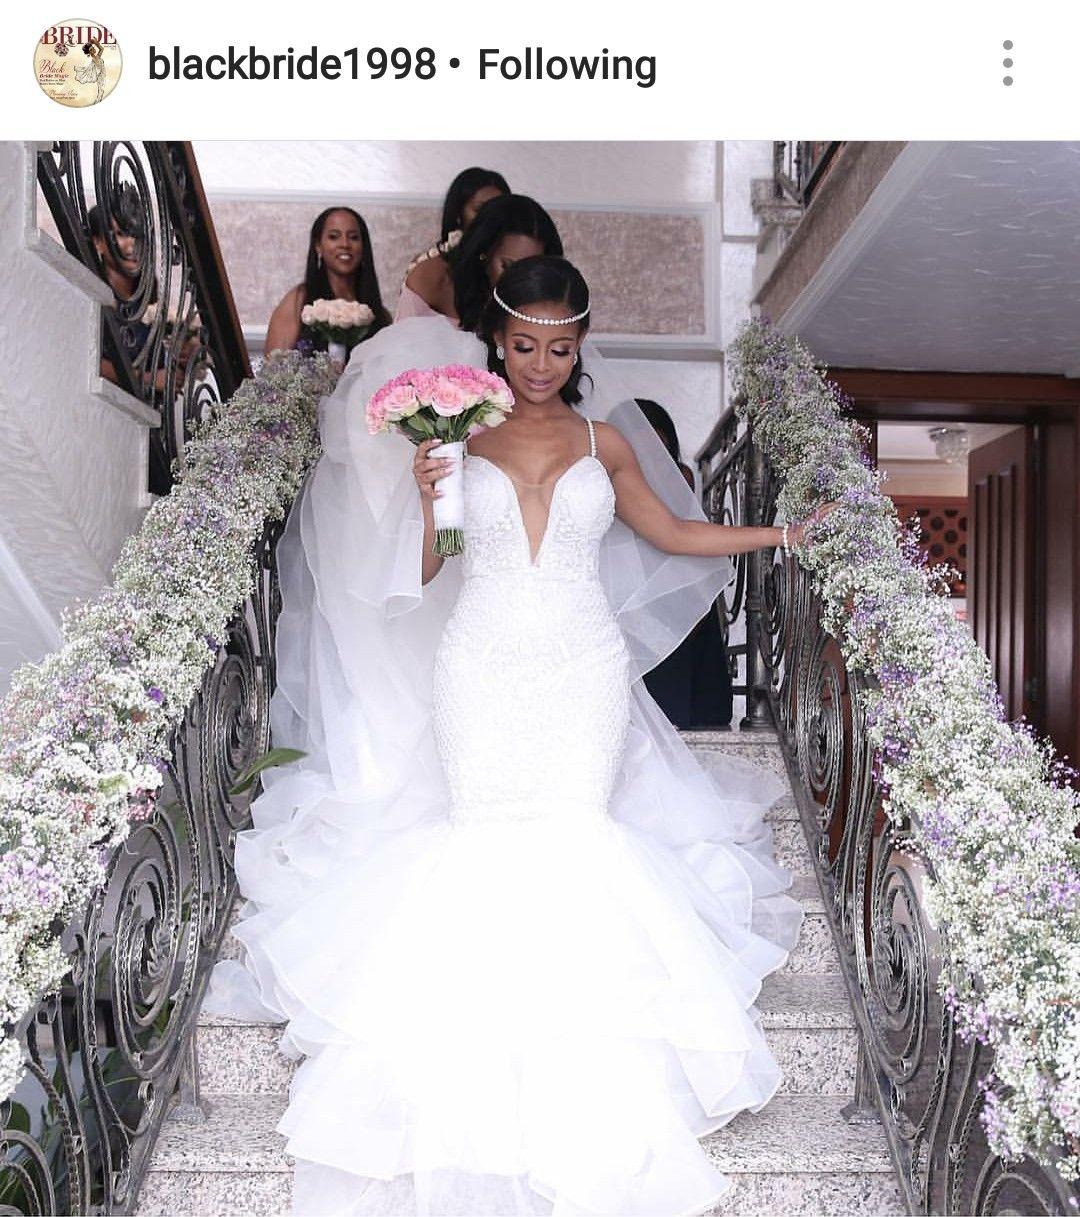 Pin By Details Complete Llc On Family Kids Black L Ve Wedding Dresses Mermaid Wedding Dress Dream Wedding Dresses [ 1217 x 1080 Pixel ]